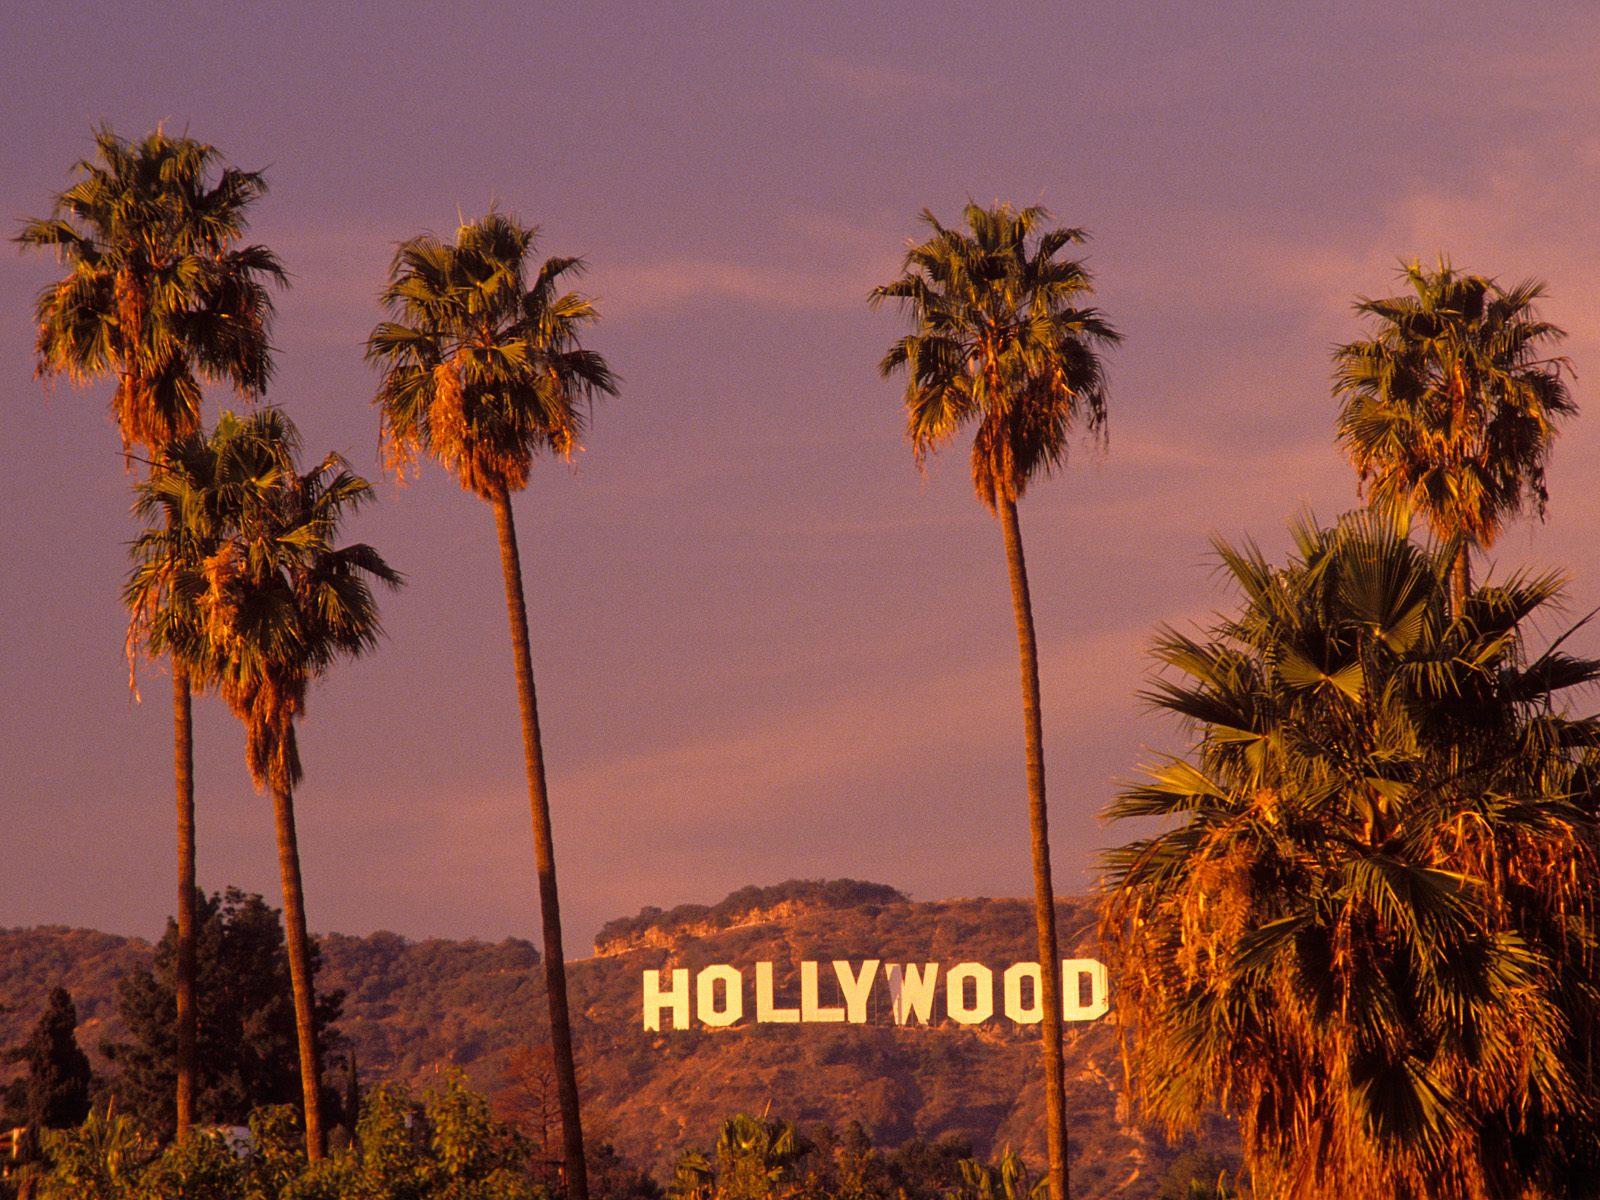 los angeles california hollywood los angeles california hollywood sign 1600x1200